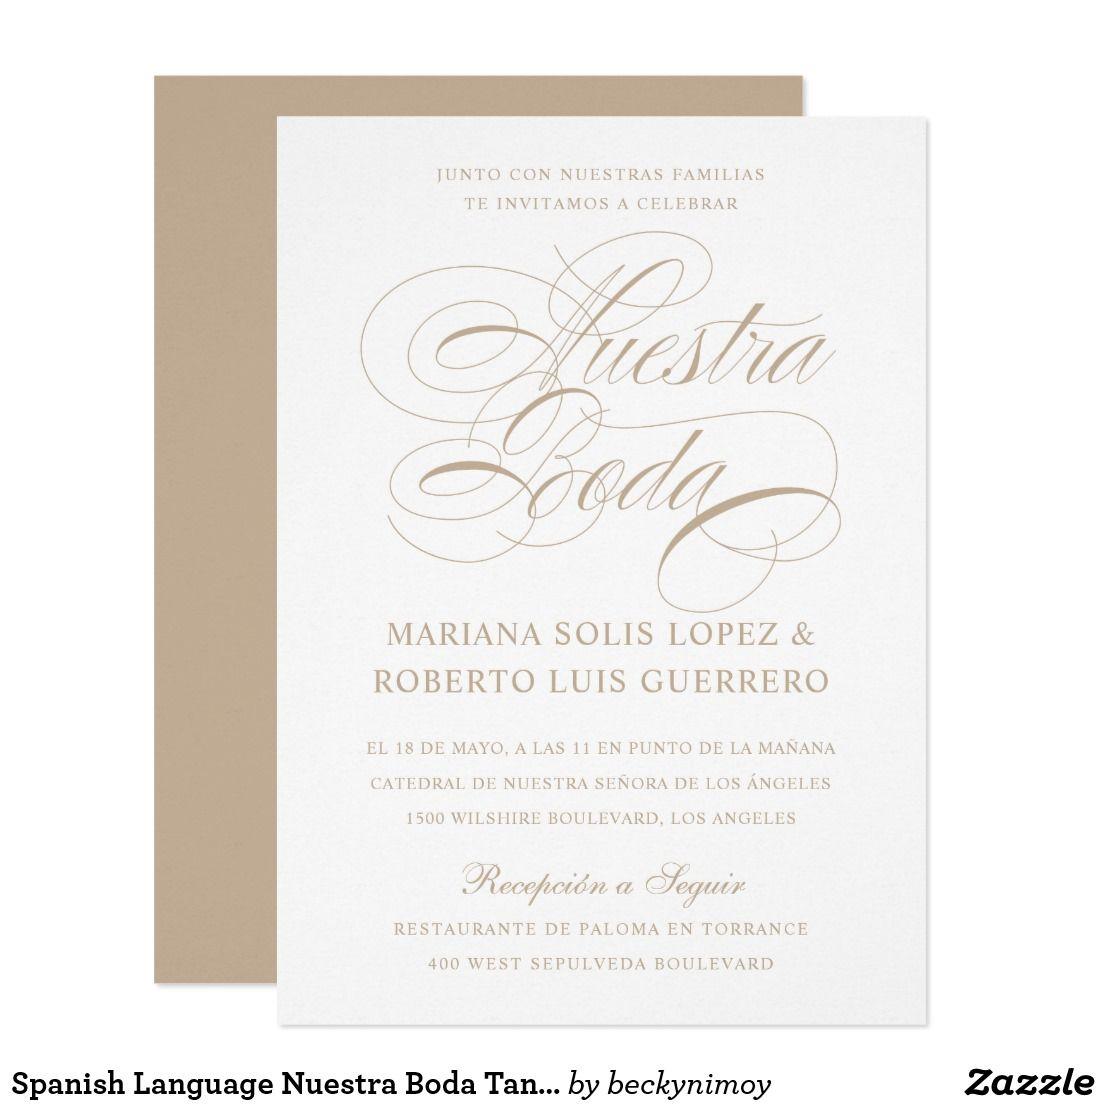 Spanish Language Nuestra Boda Tan Wedding Invitation Zazzle Com